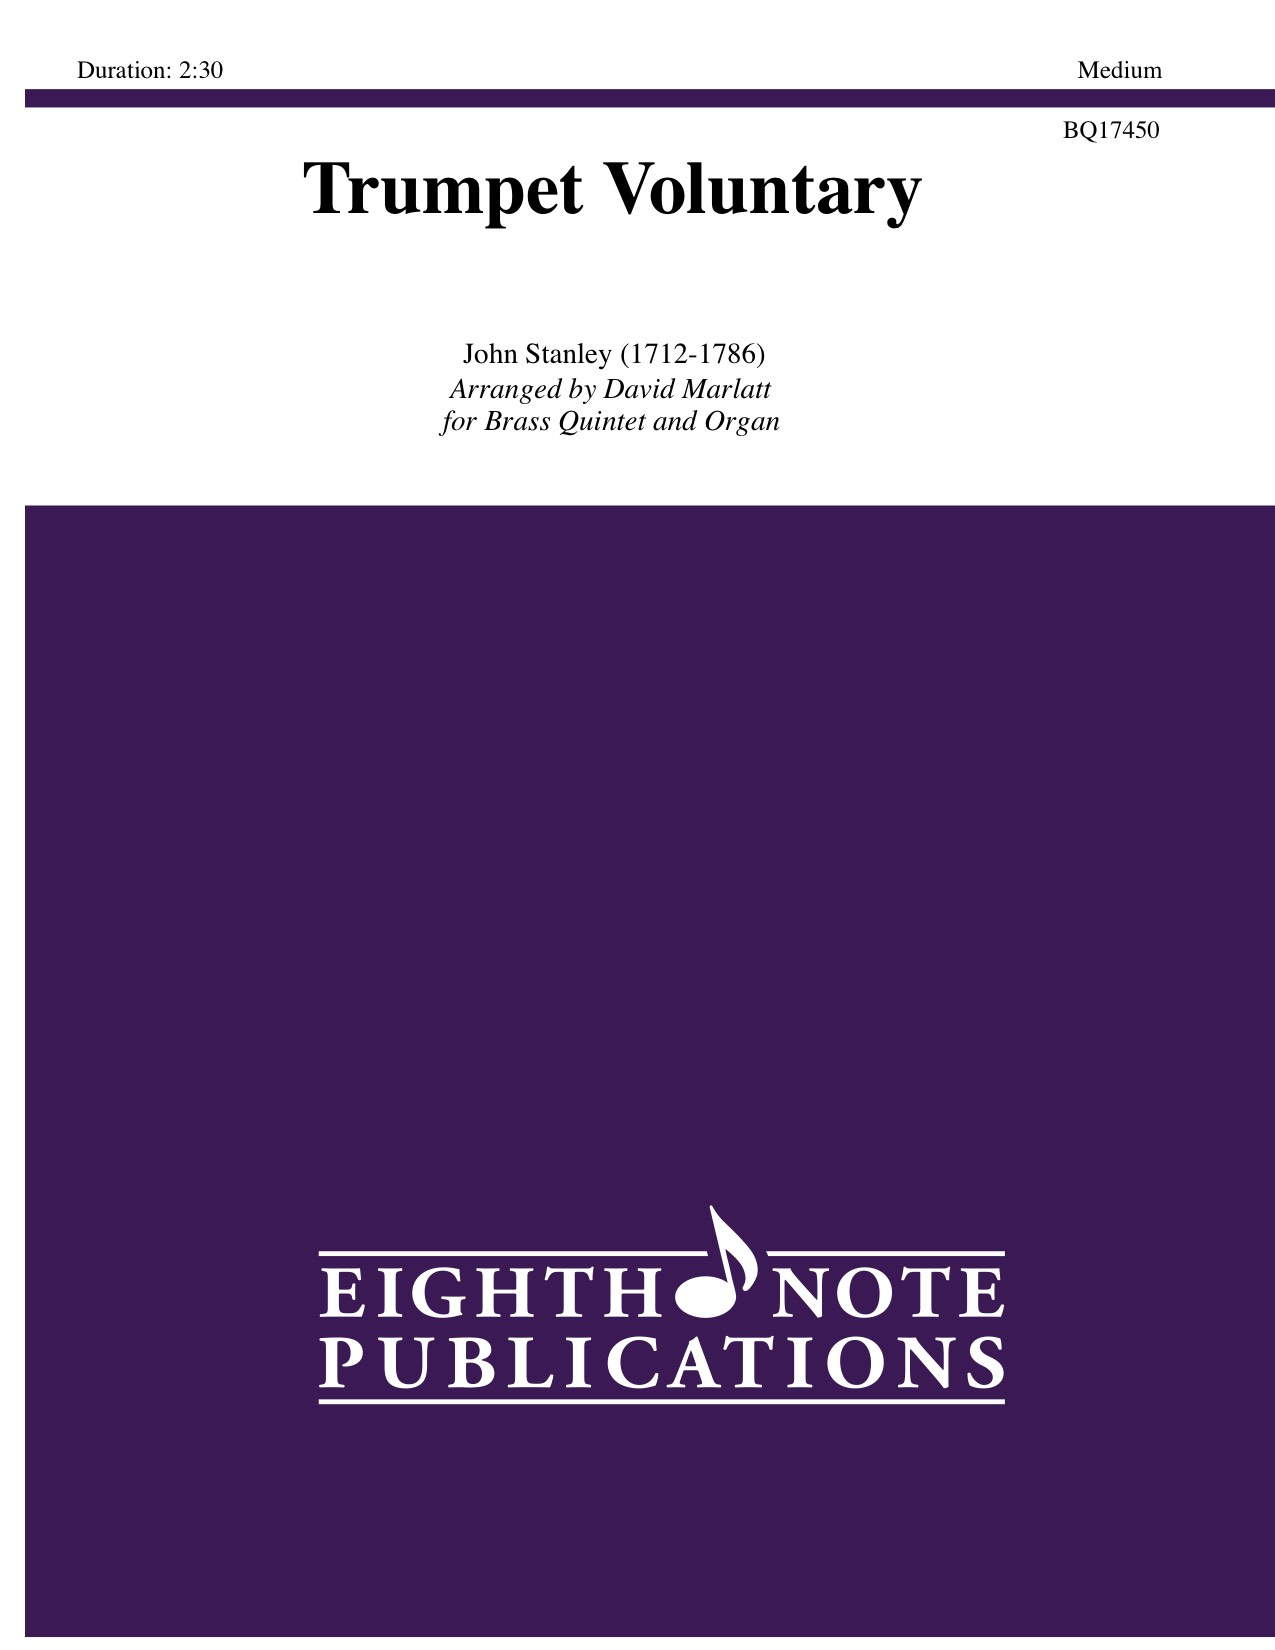 Trumpet Voluntary - John Stanley